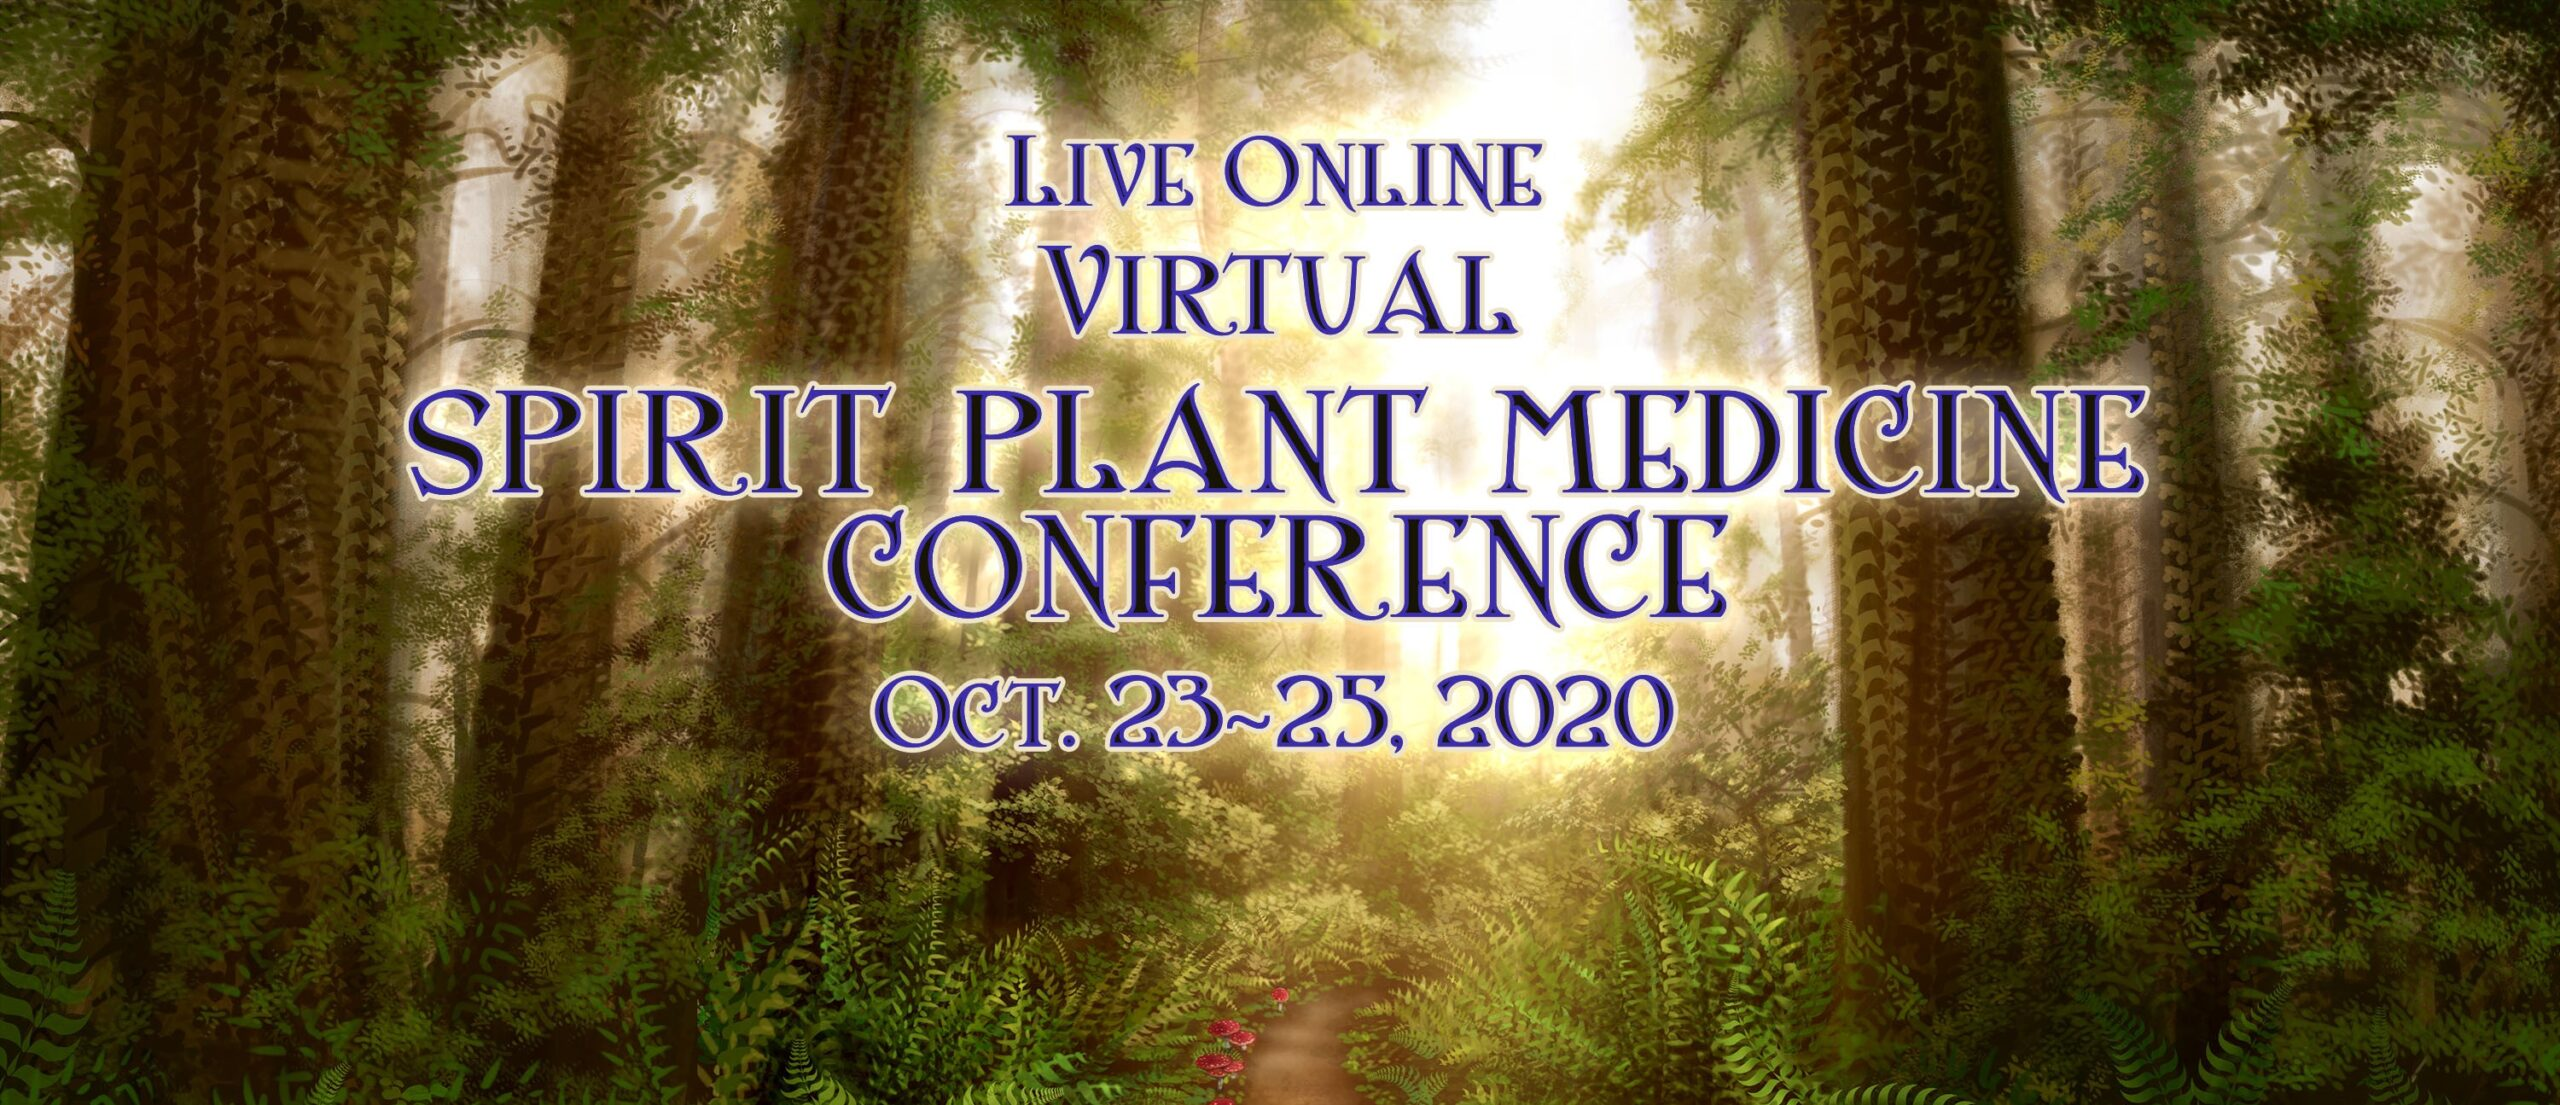 October 23-25 Annual Spirit Plant Medicine Conference  **Virtual**  2020